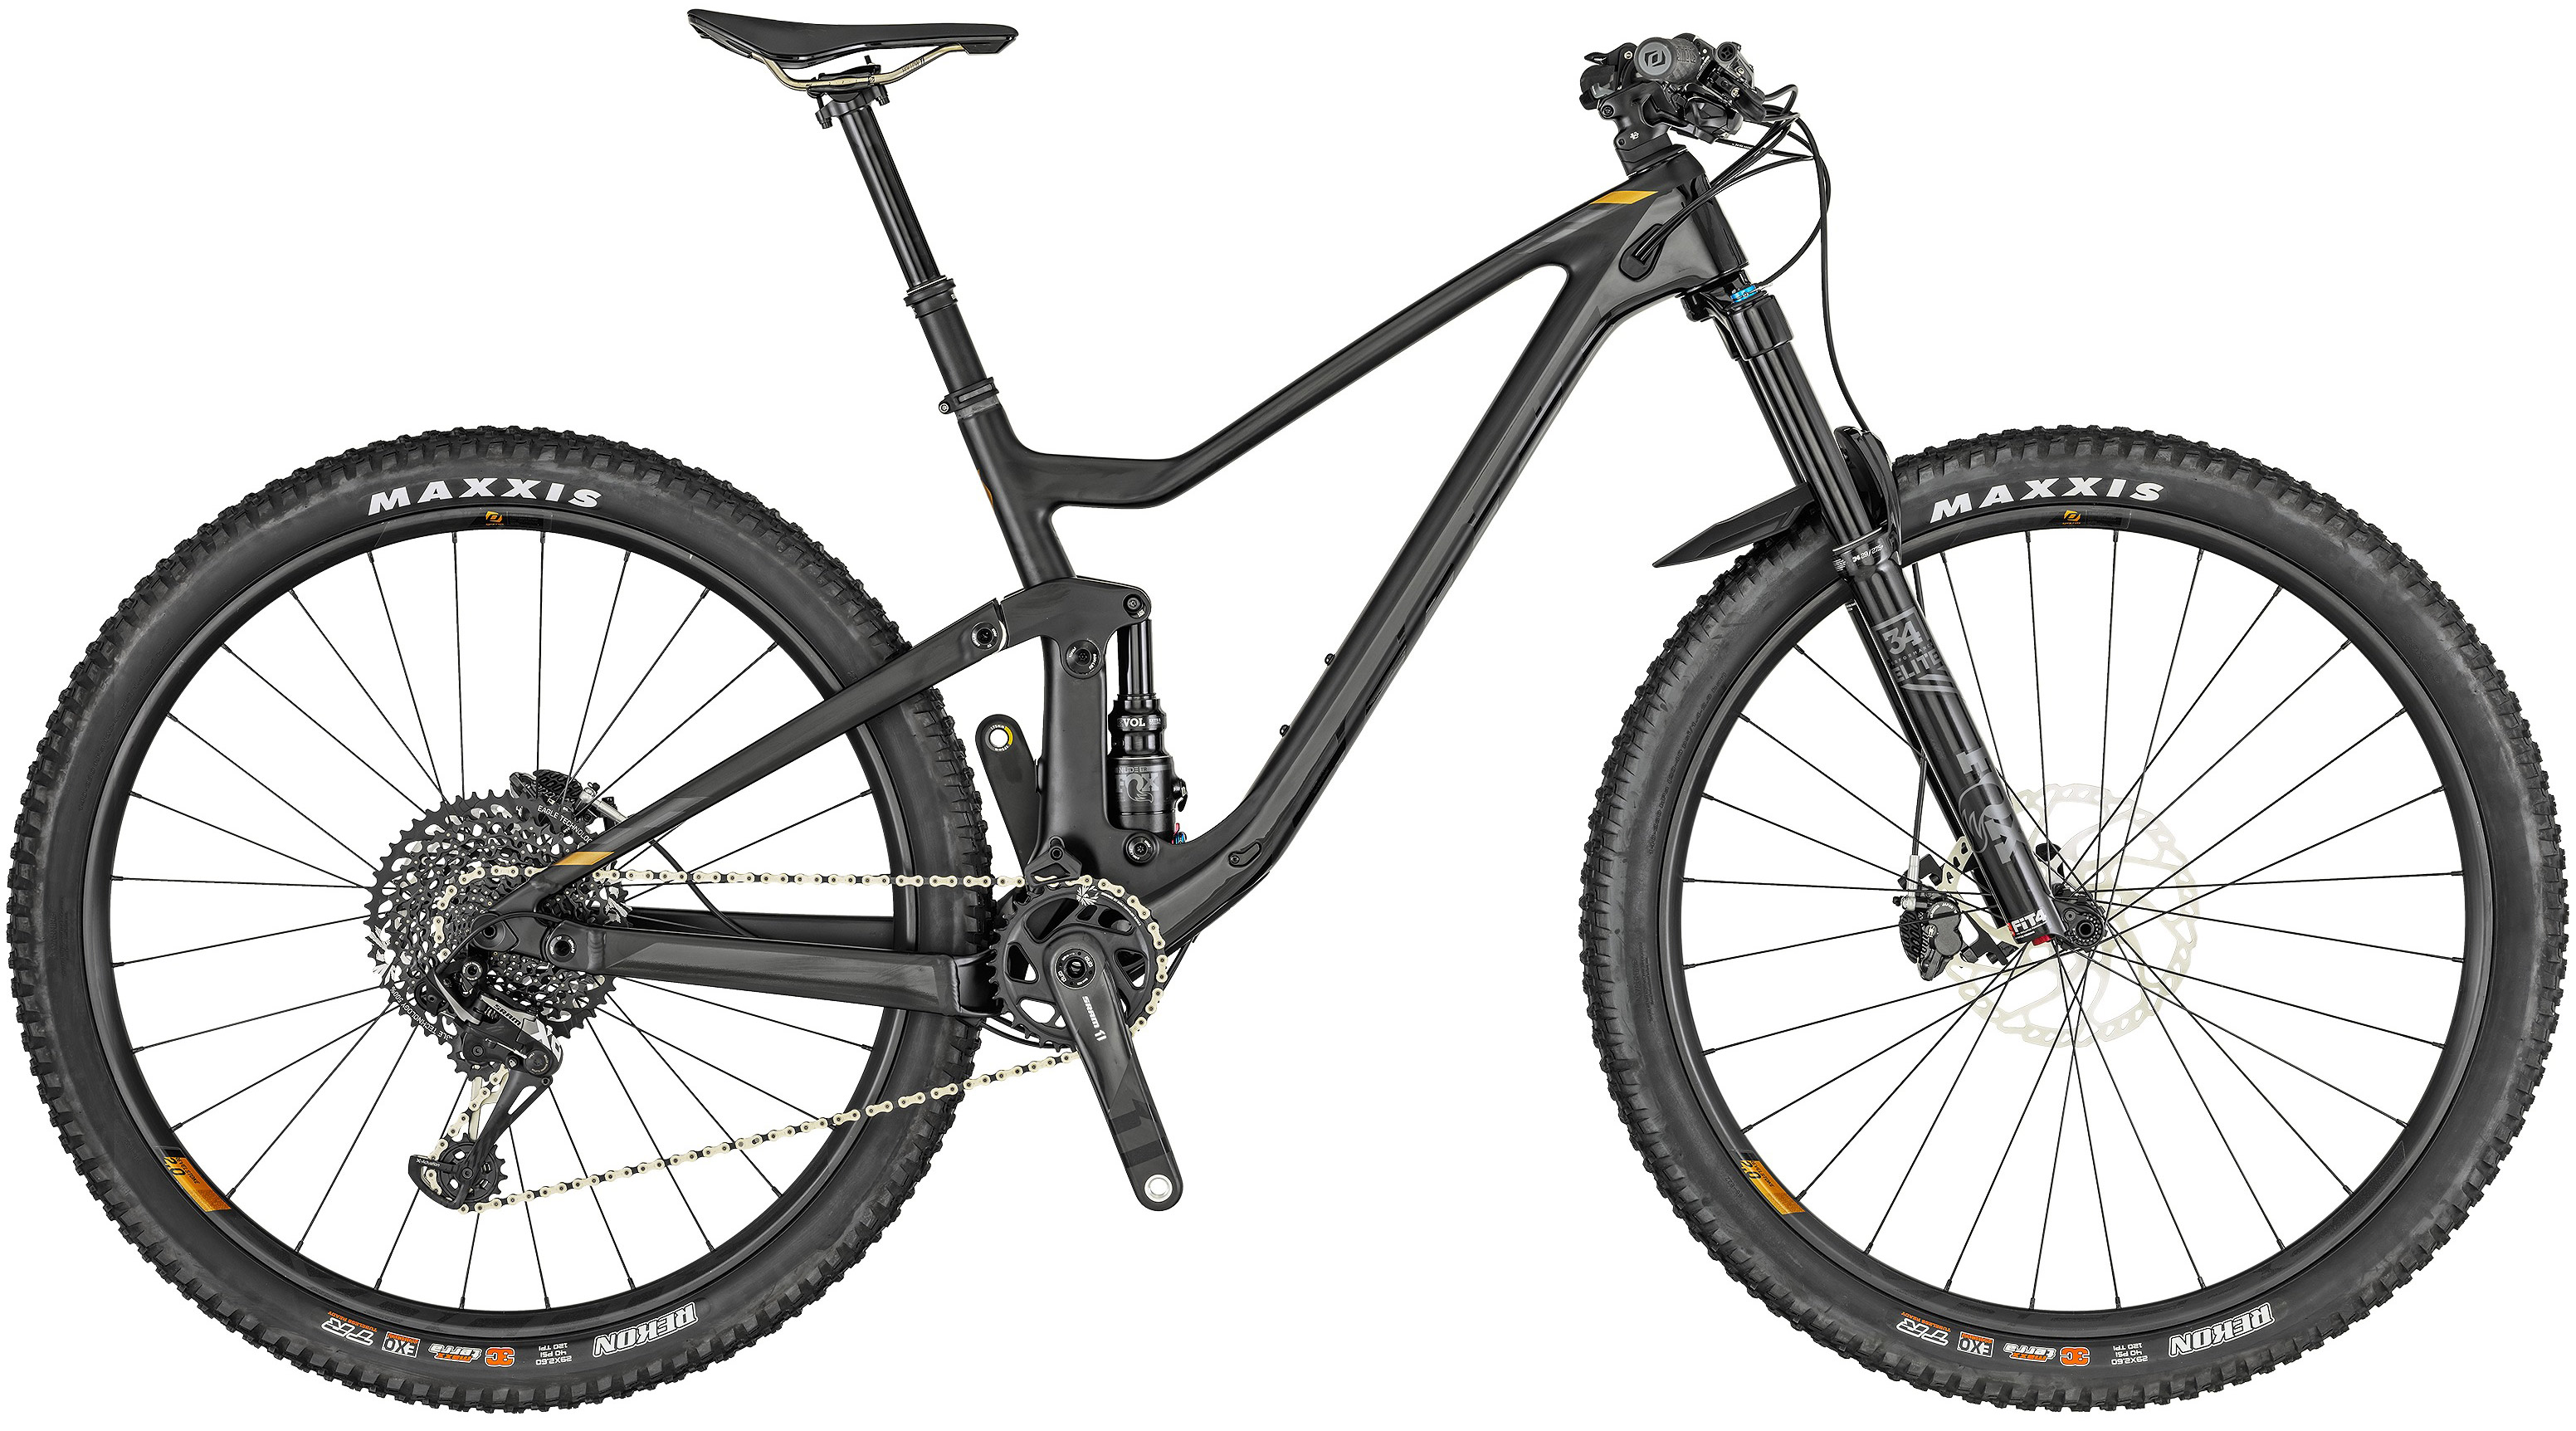 f229ea893f Scott Genius 710 Modell 2019 - Bike-3, der Scott Fahrrad Spezialist